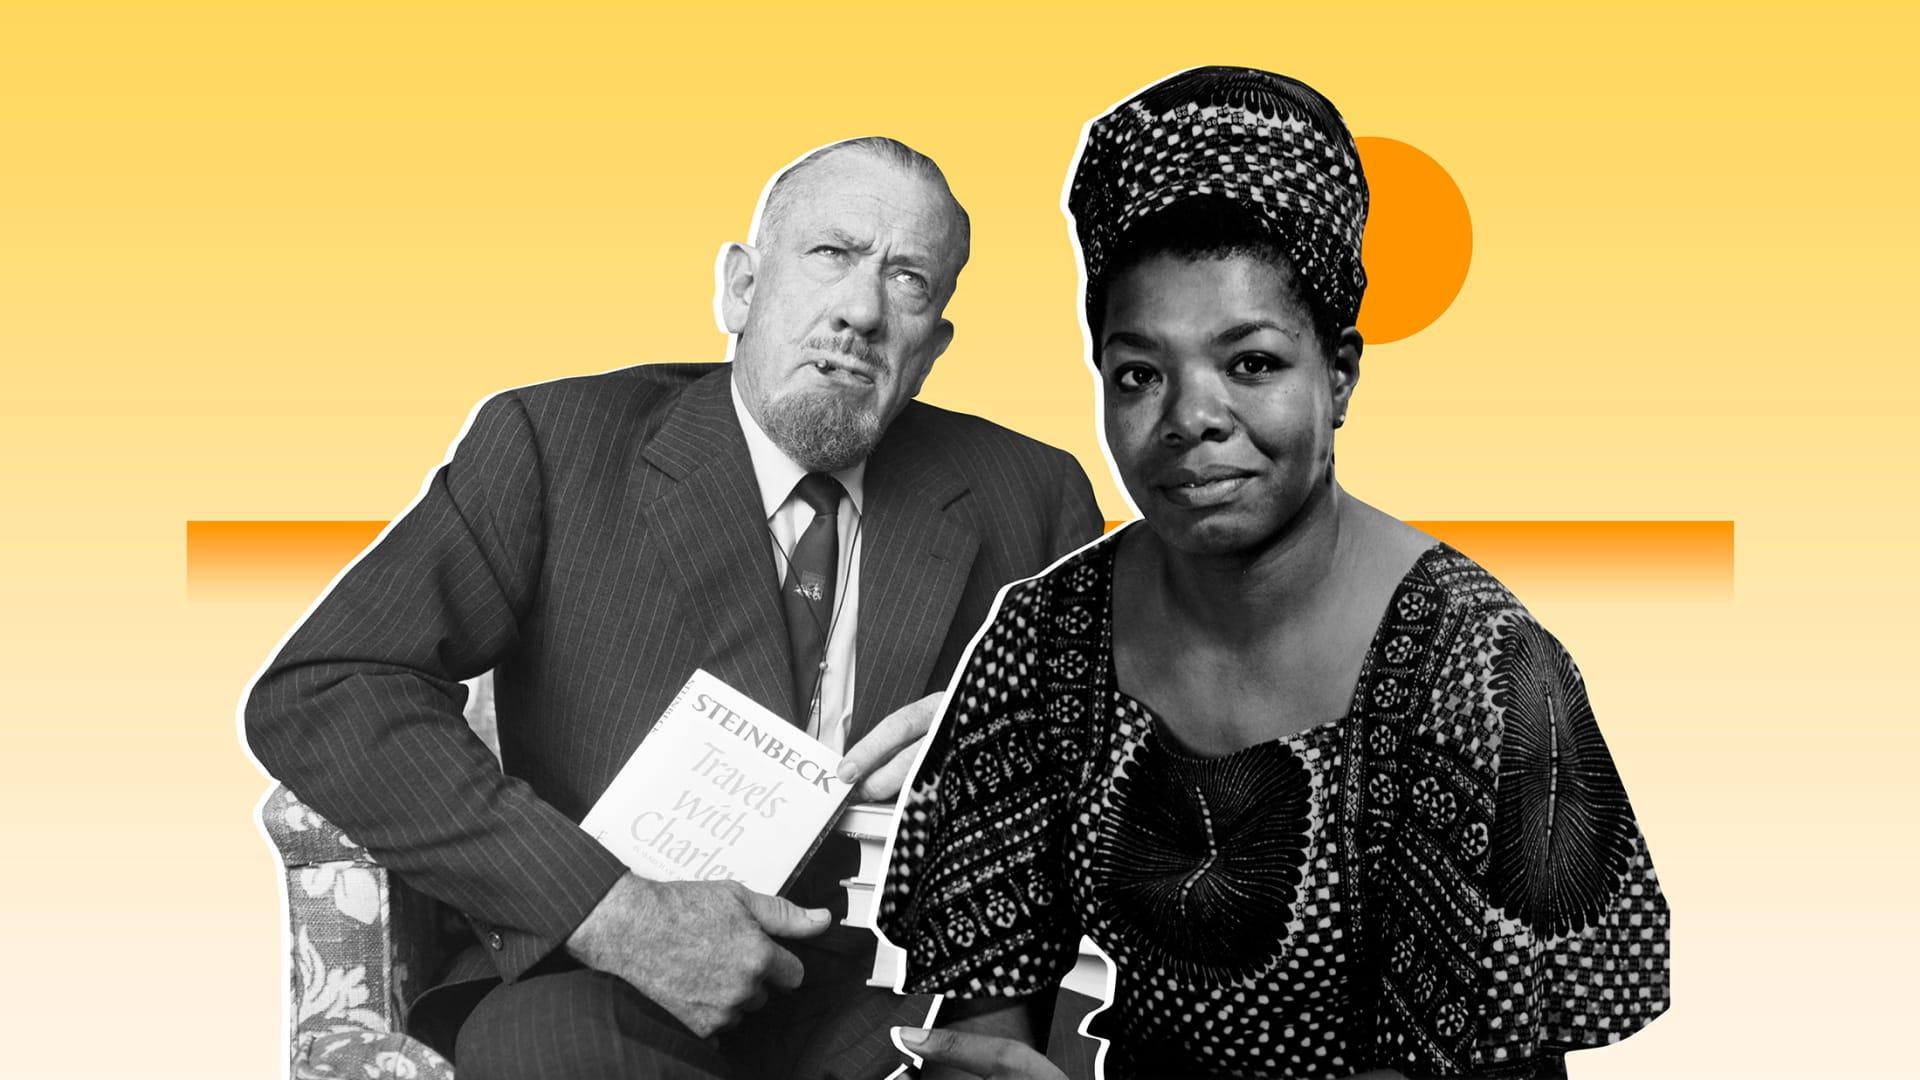 From left: John Steinbeck, Maya Angelou.